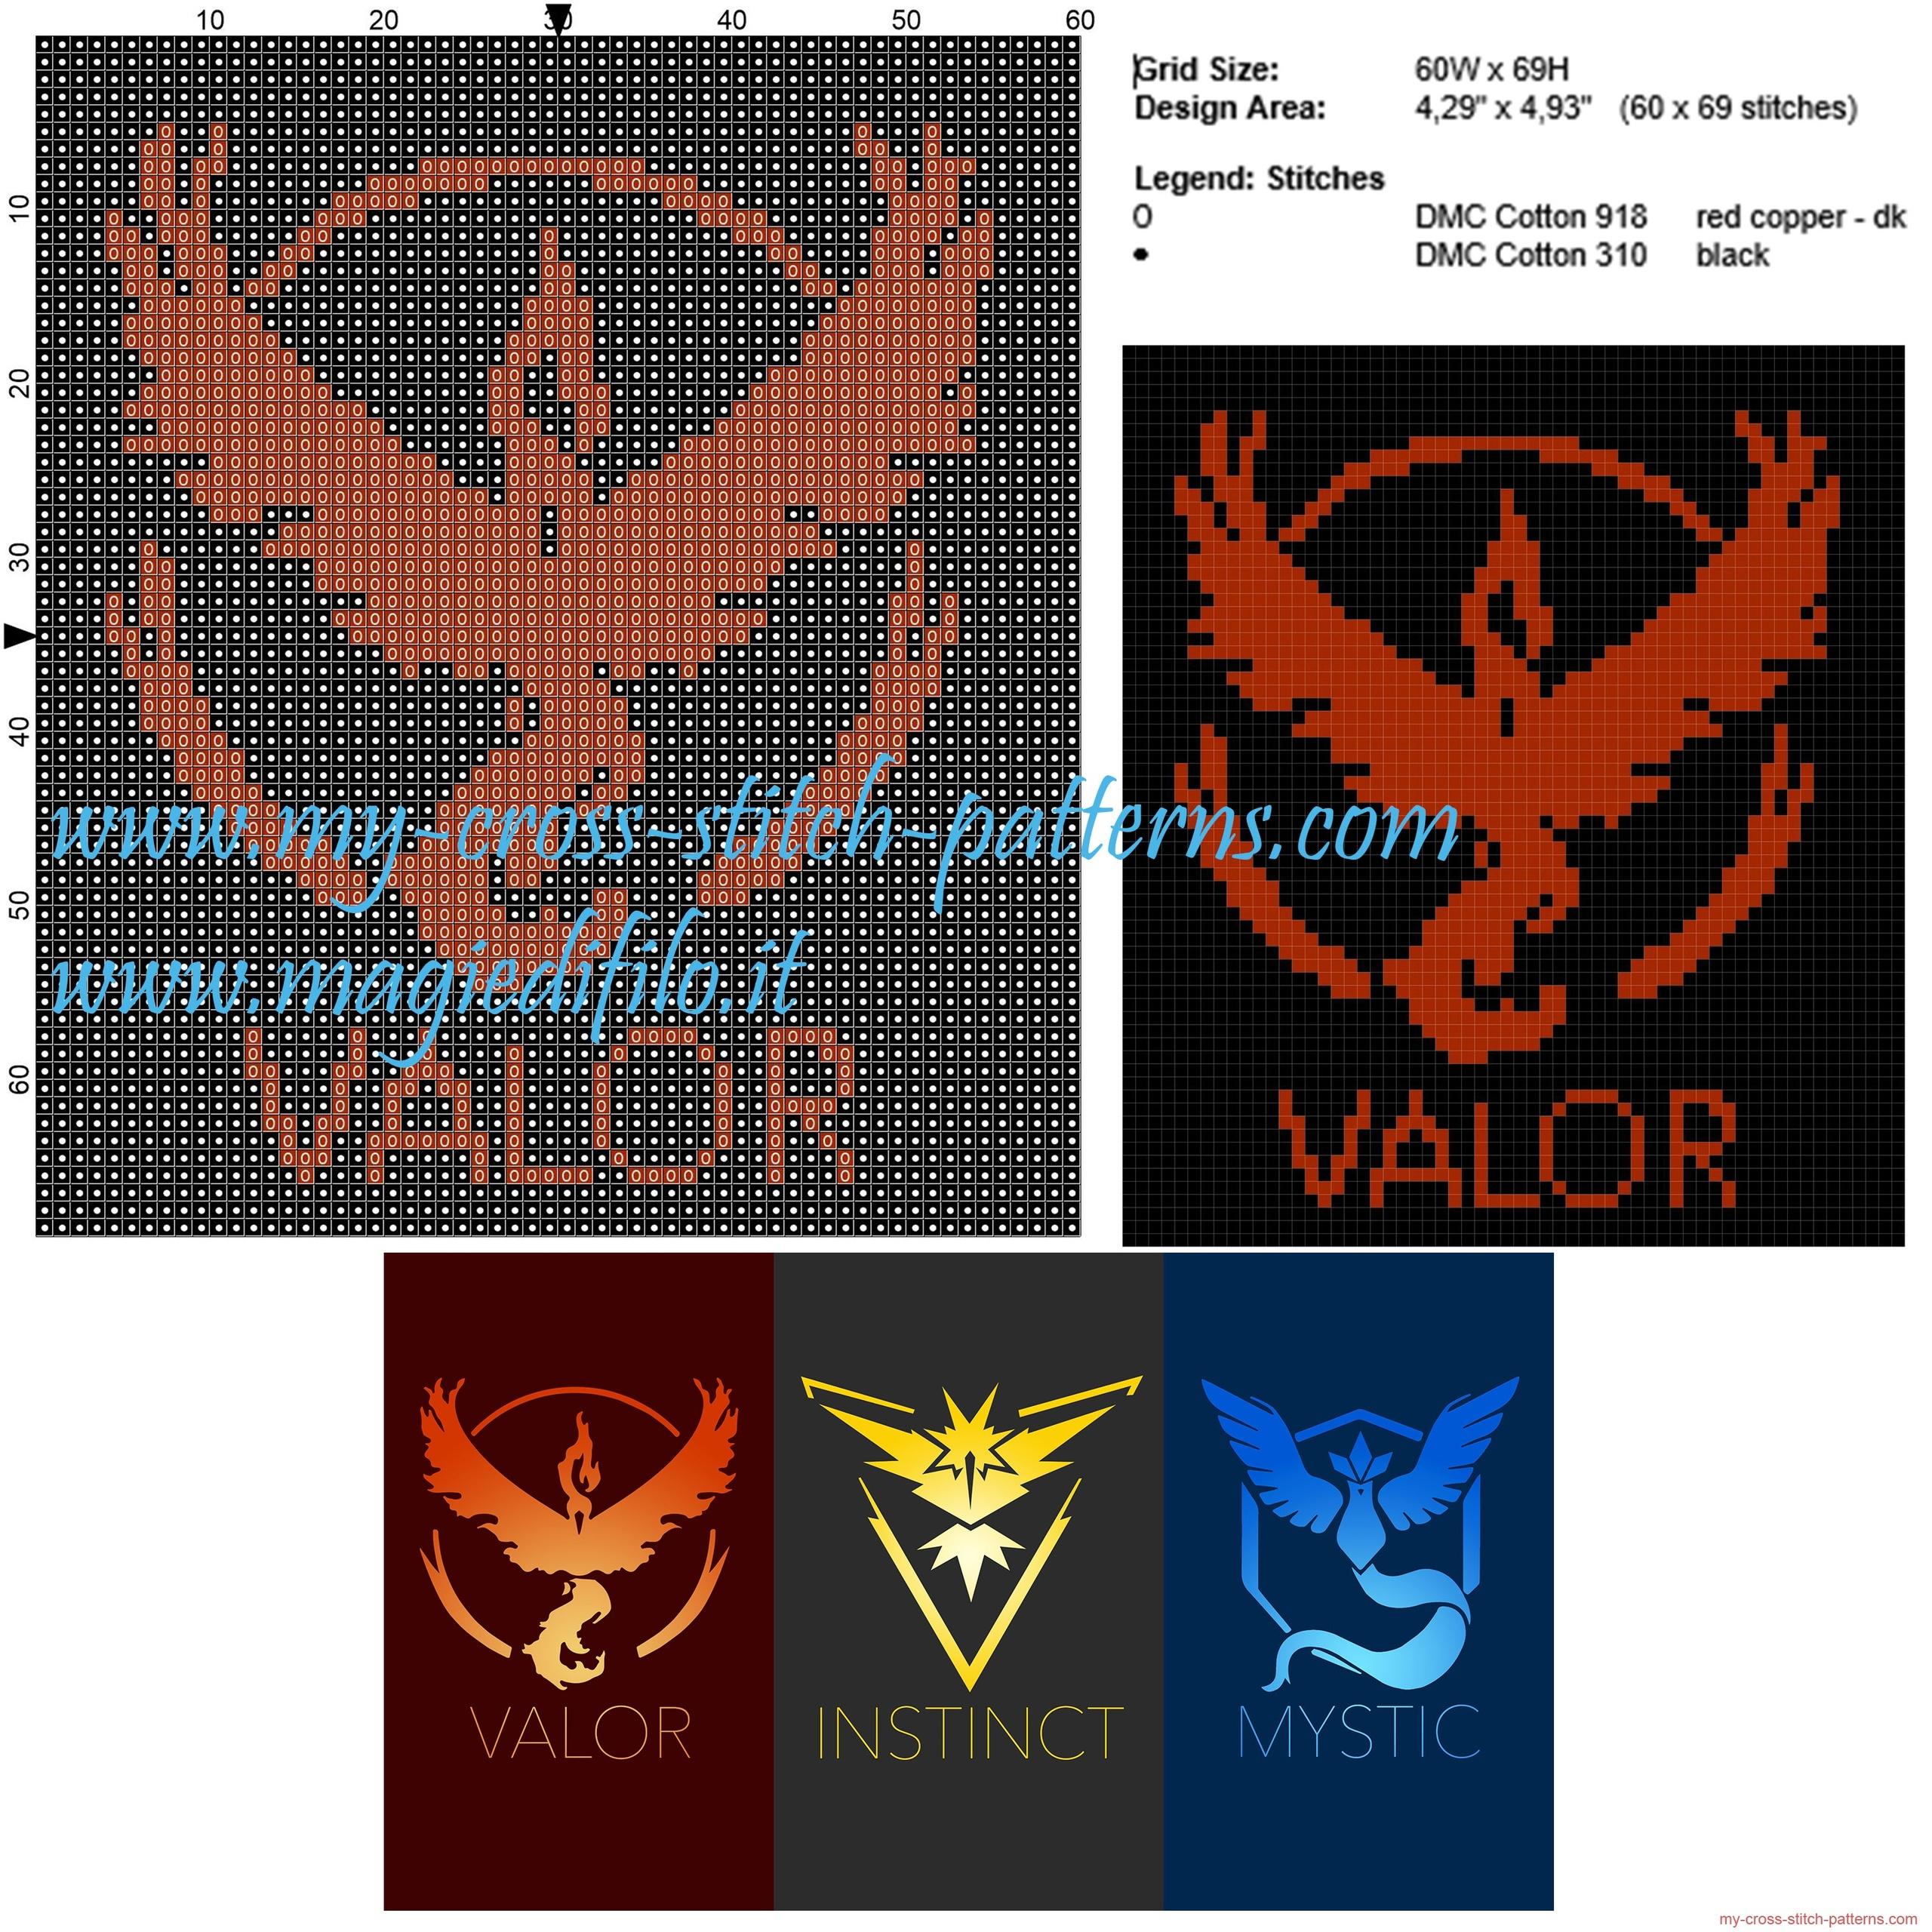 team_valor_pokemon_go_cross_stitch_pattern_